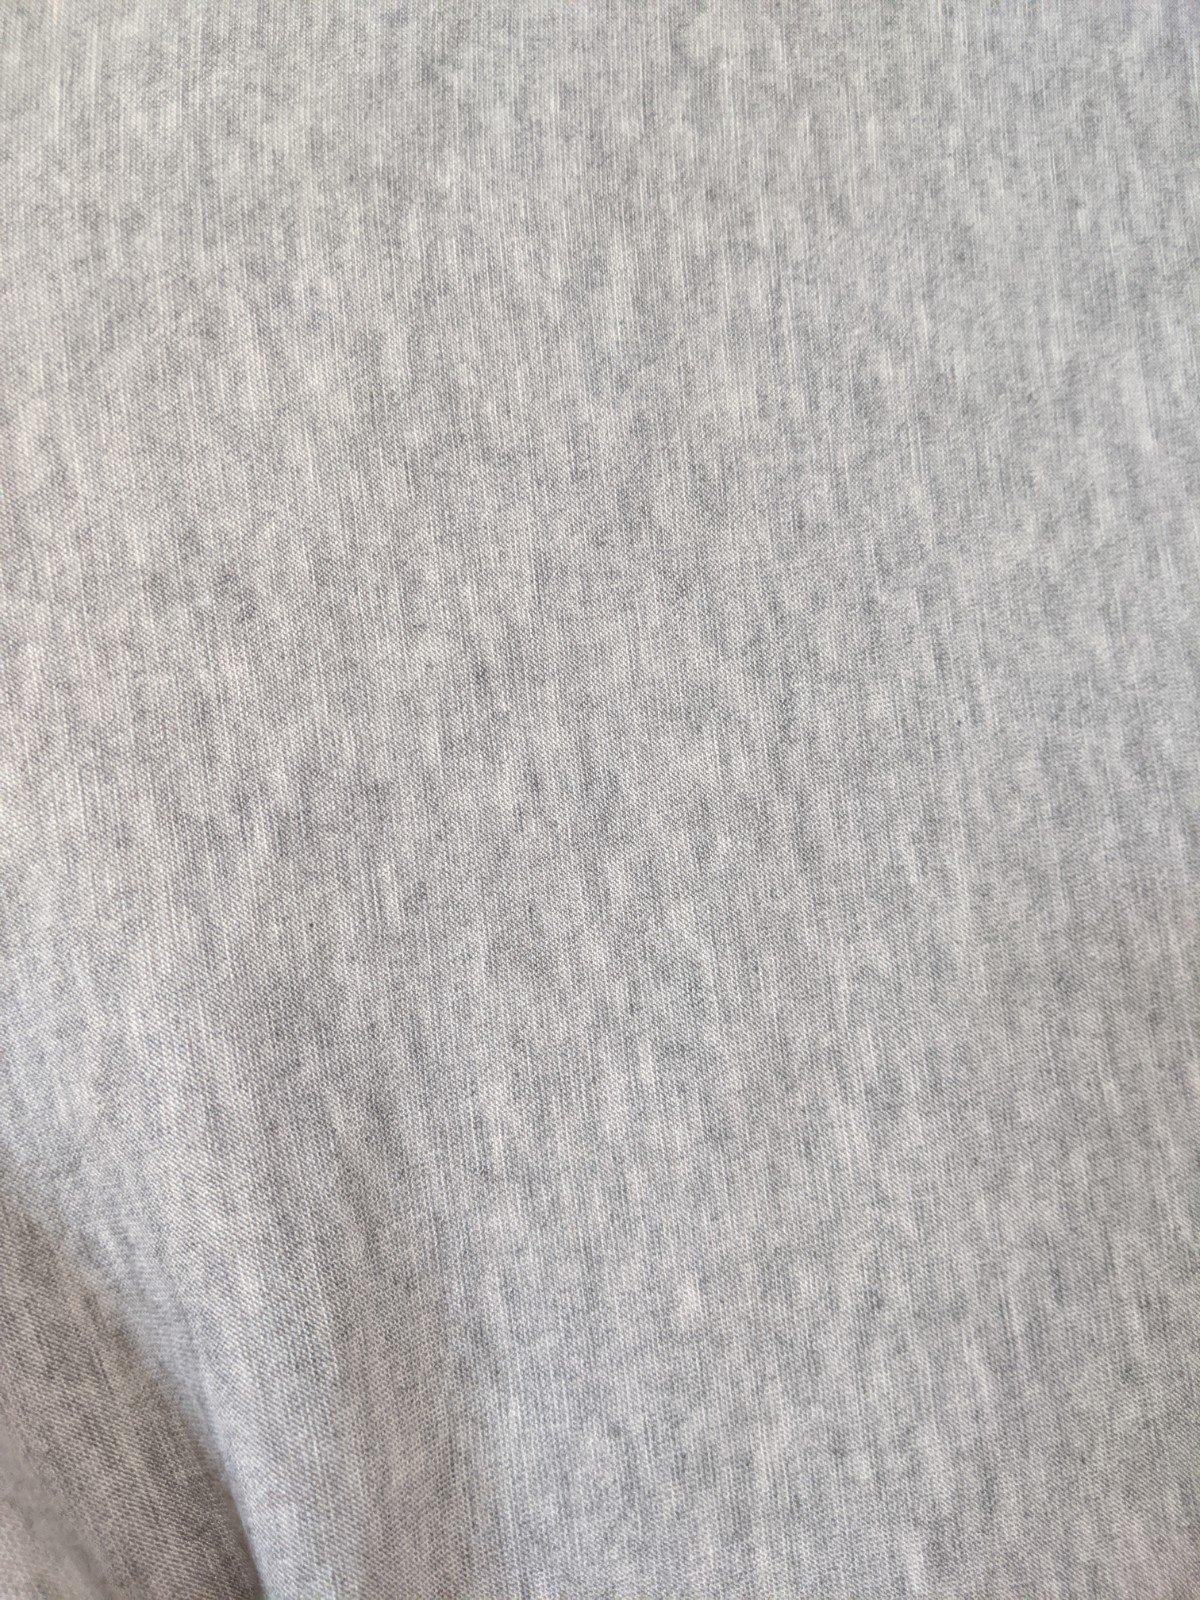 Heathered Grey Jersey Knit